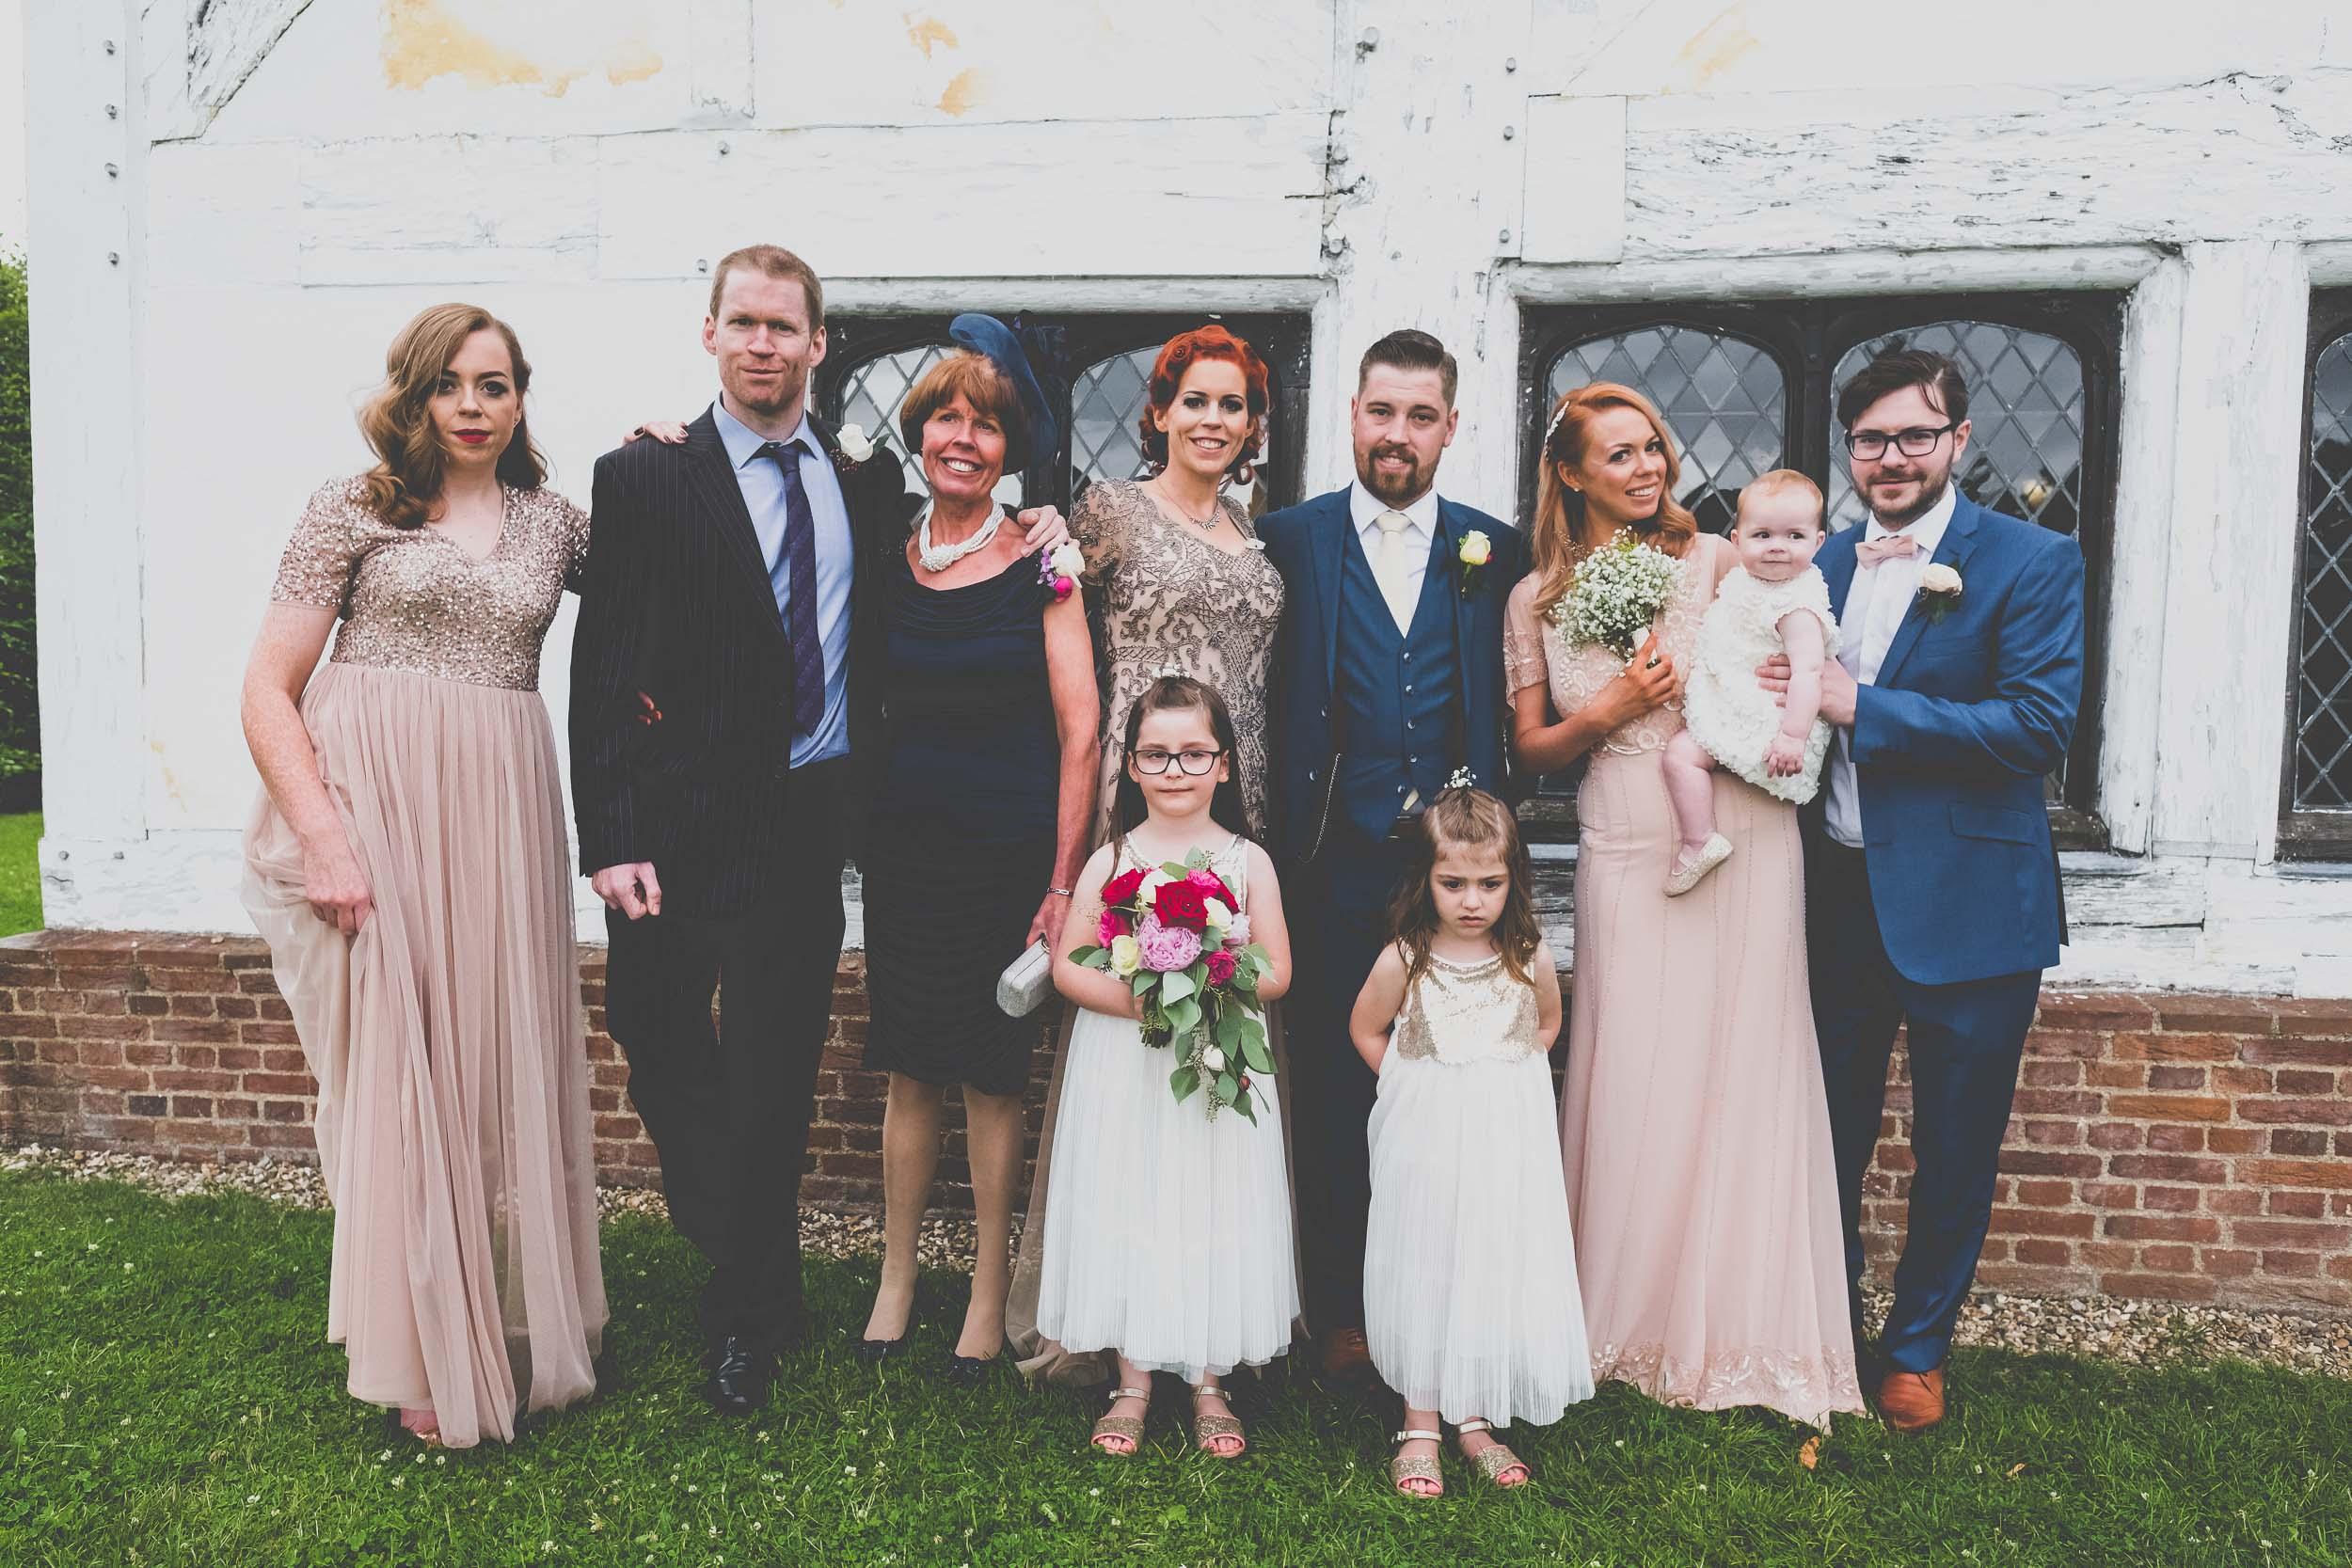 queen-elizabeths-hunting-lodge-epping-forest-wedding179.jpg